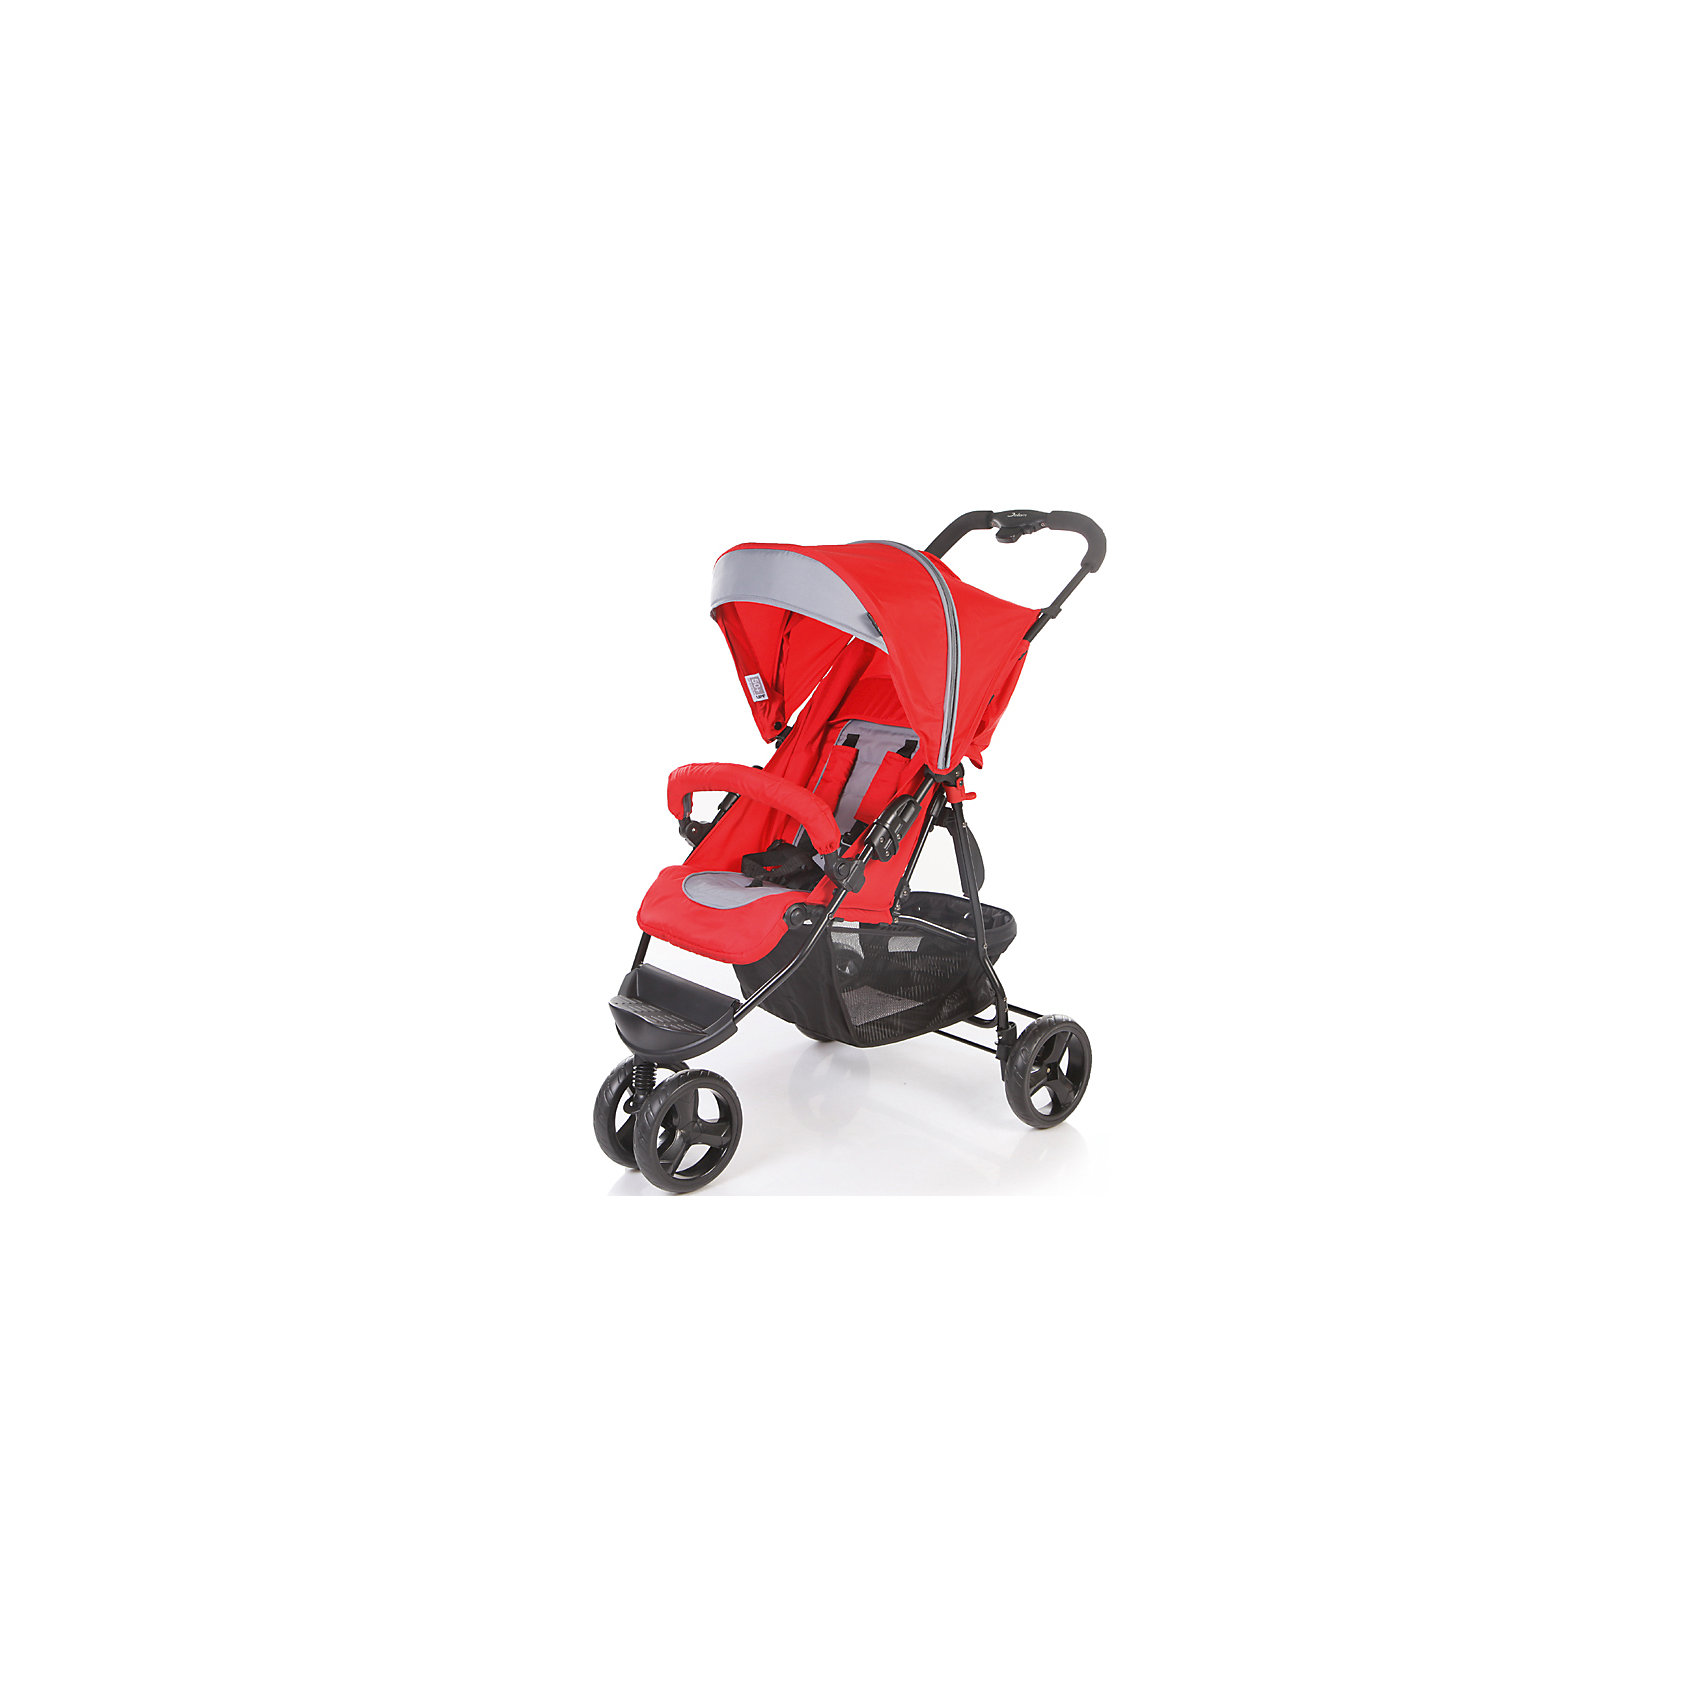 Прогулочная коляска Jetem Mira Lite, красный/тёмно-серый Red/Dark Grey